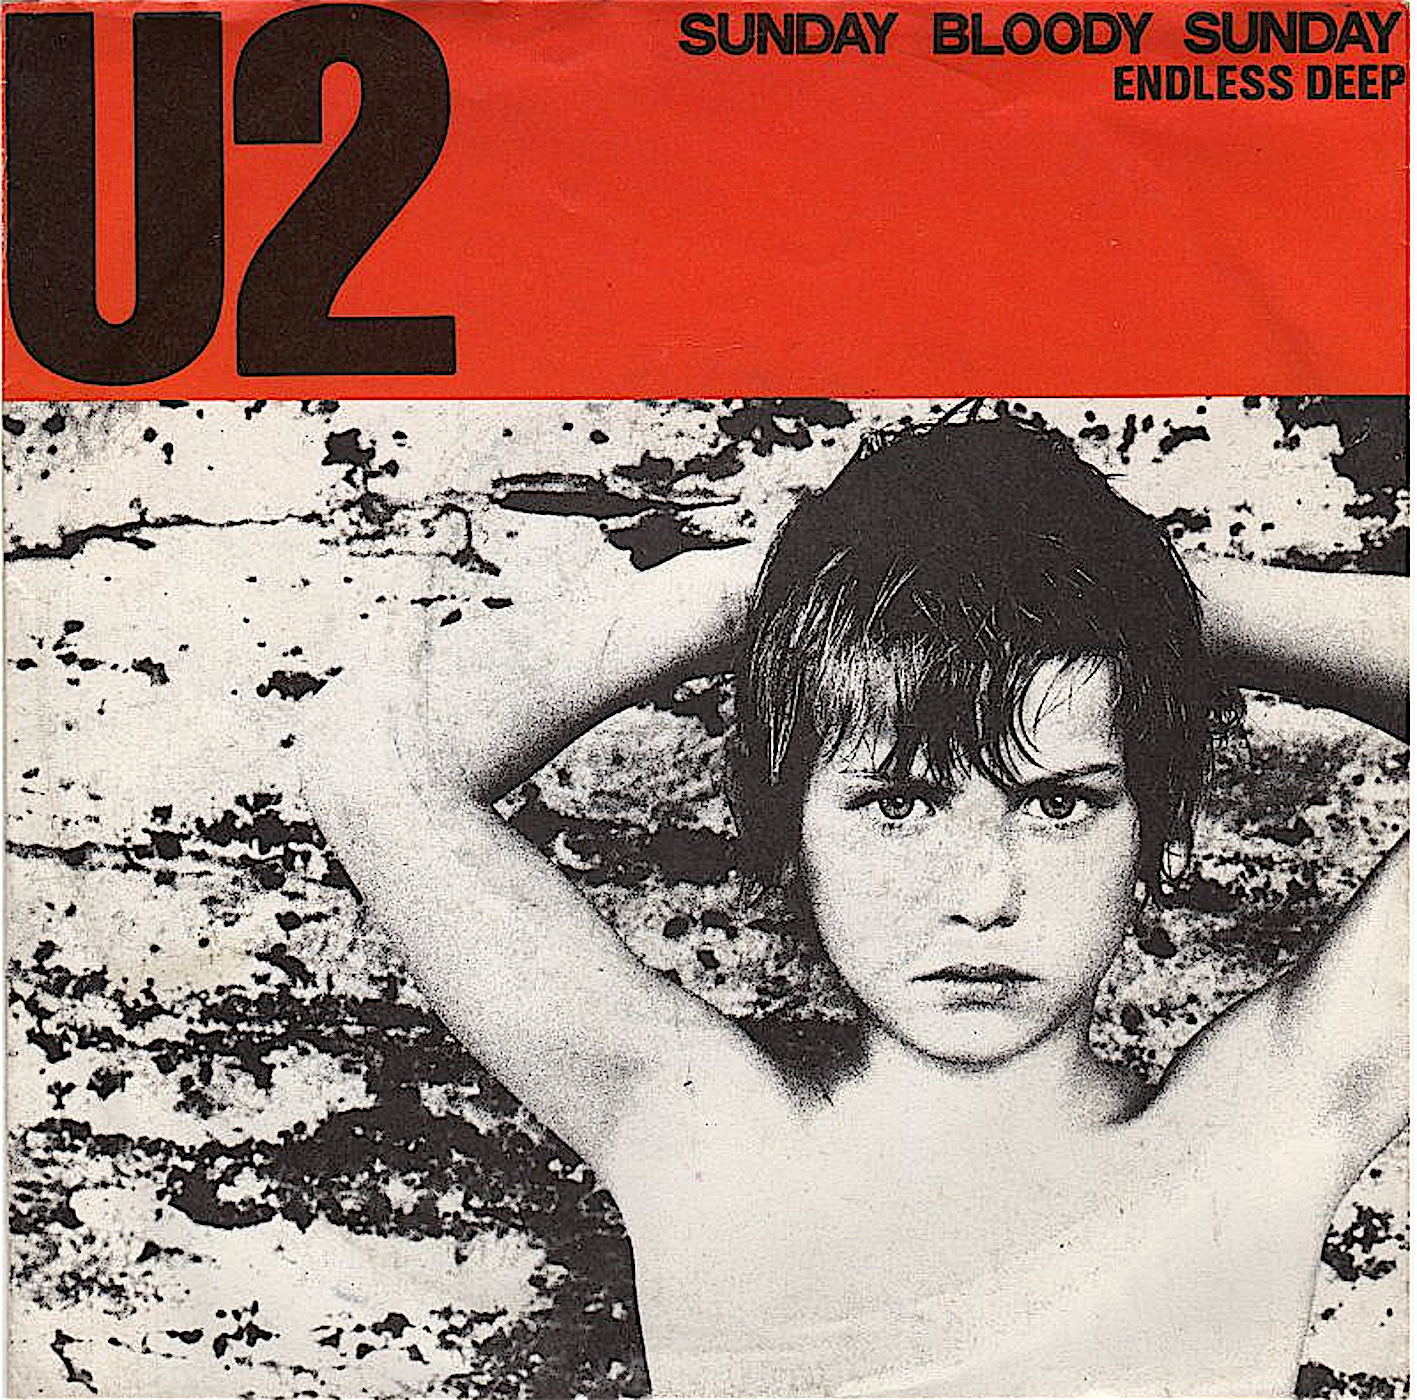 u2_sunday_bloody_sunday_copertina_originale_45_giri